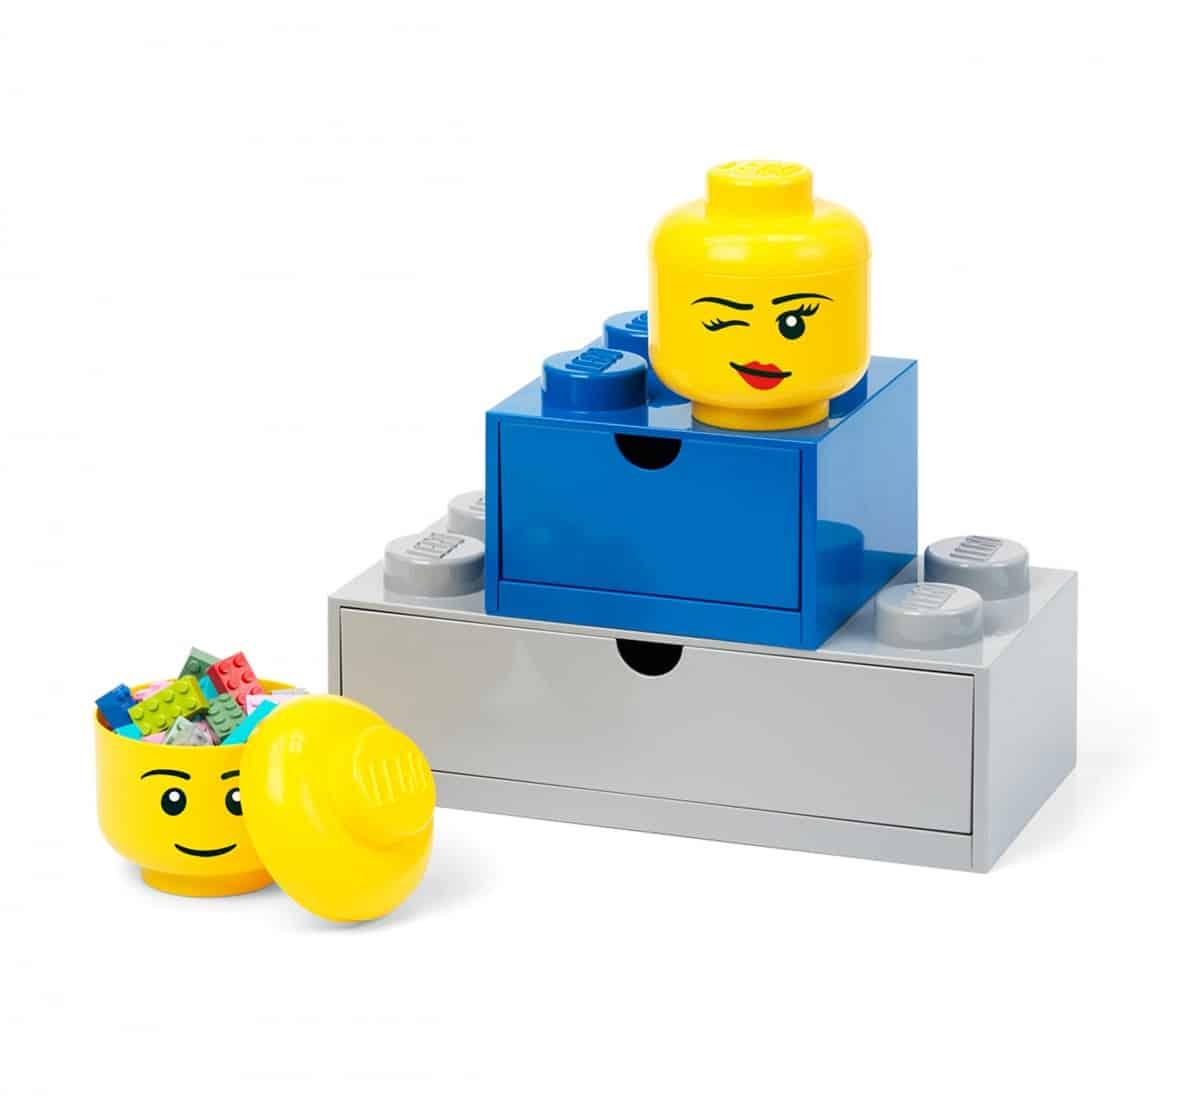 lego 5006211 storage head mini winking scaled